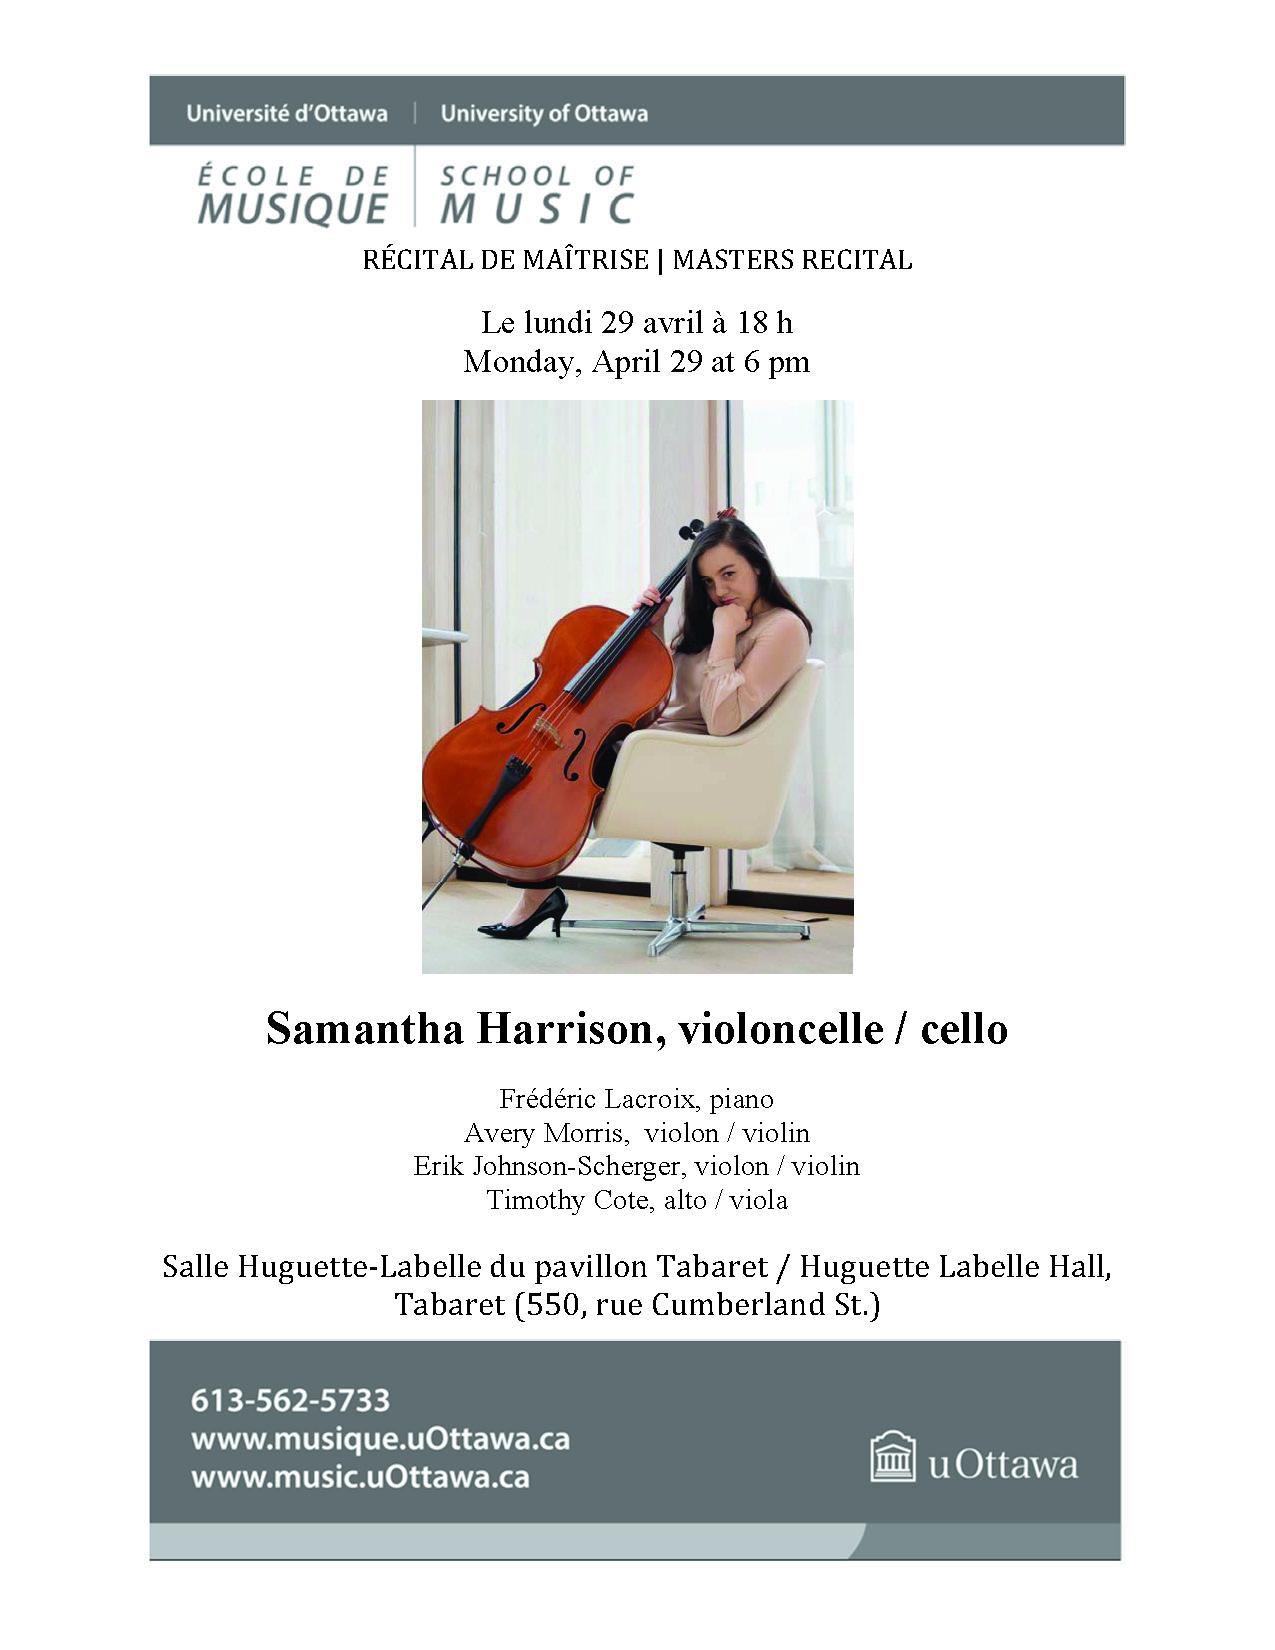 Recital program for Sam Harrison, page 1